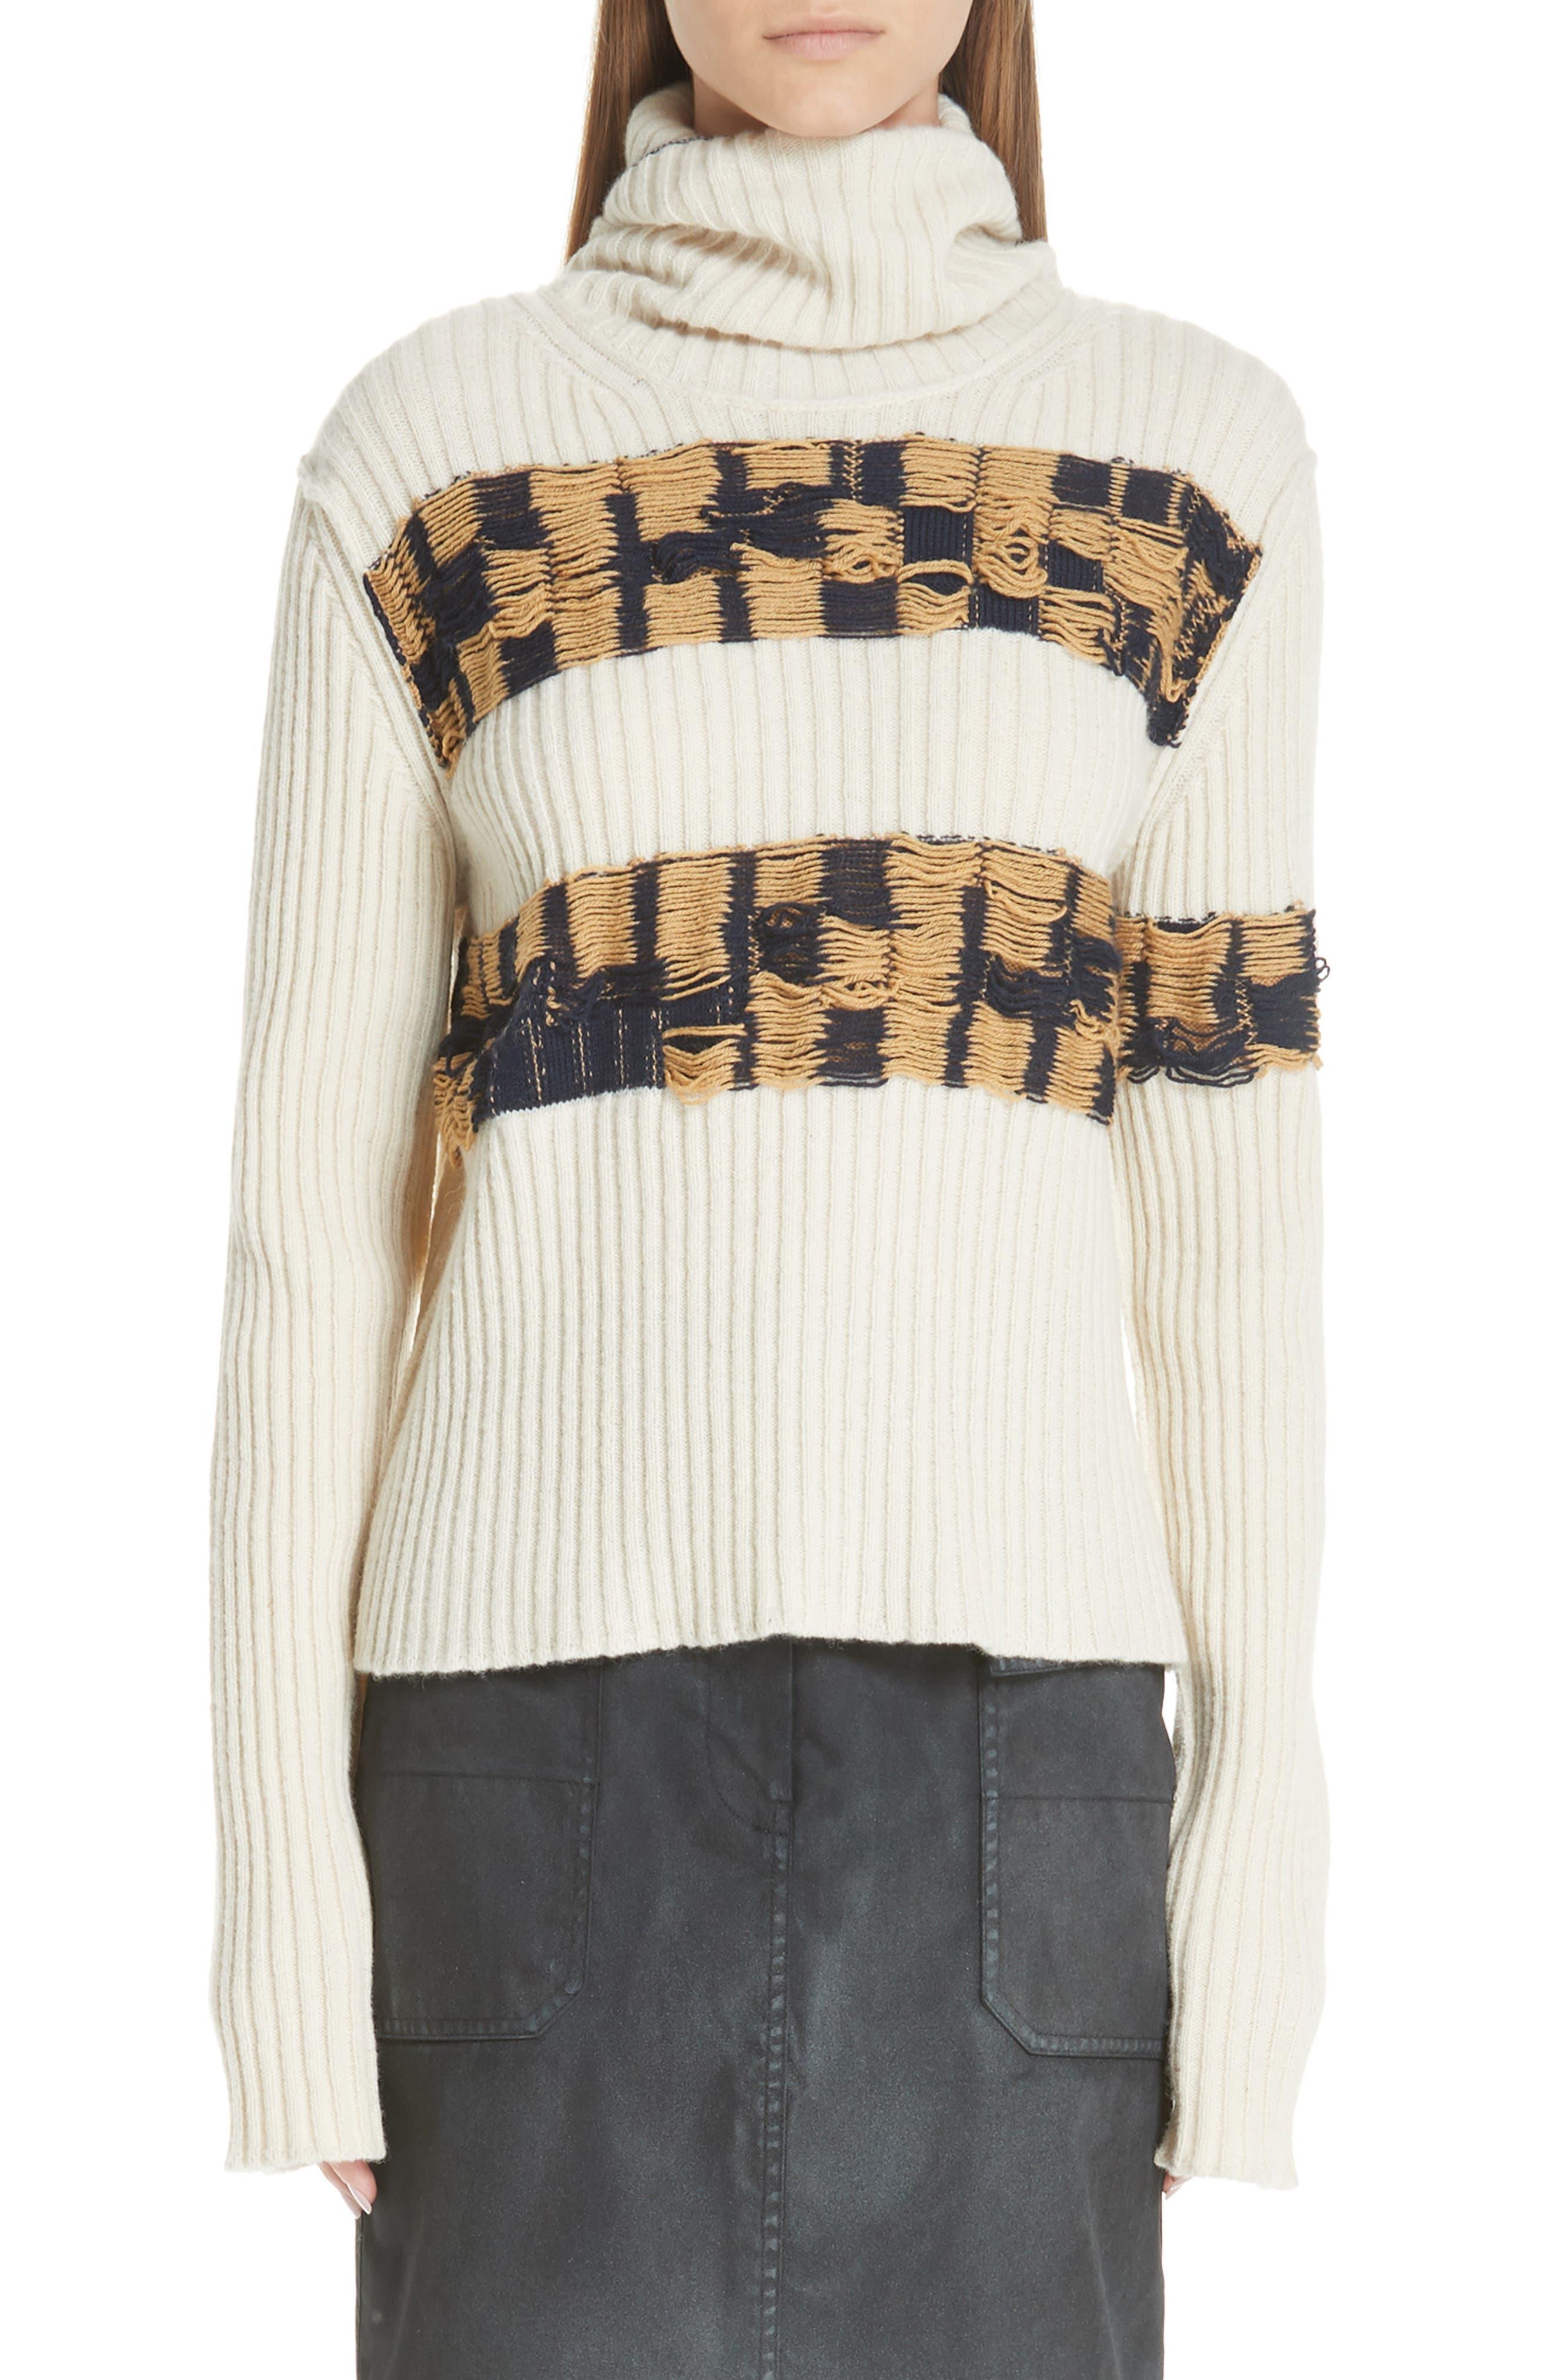 Quilt Jacquard Stripe Sweater,                             Main thumbnail 1, color,                             ECRU HAY NAVY